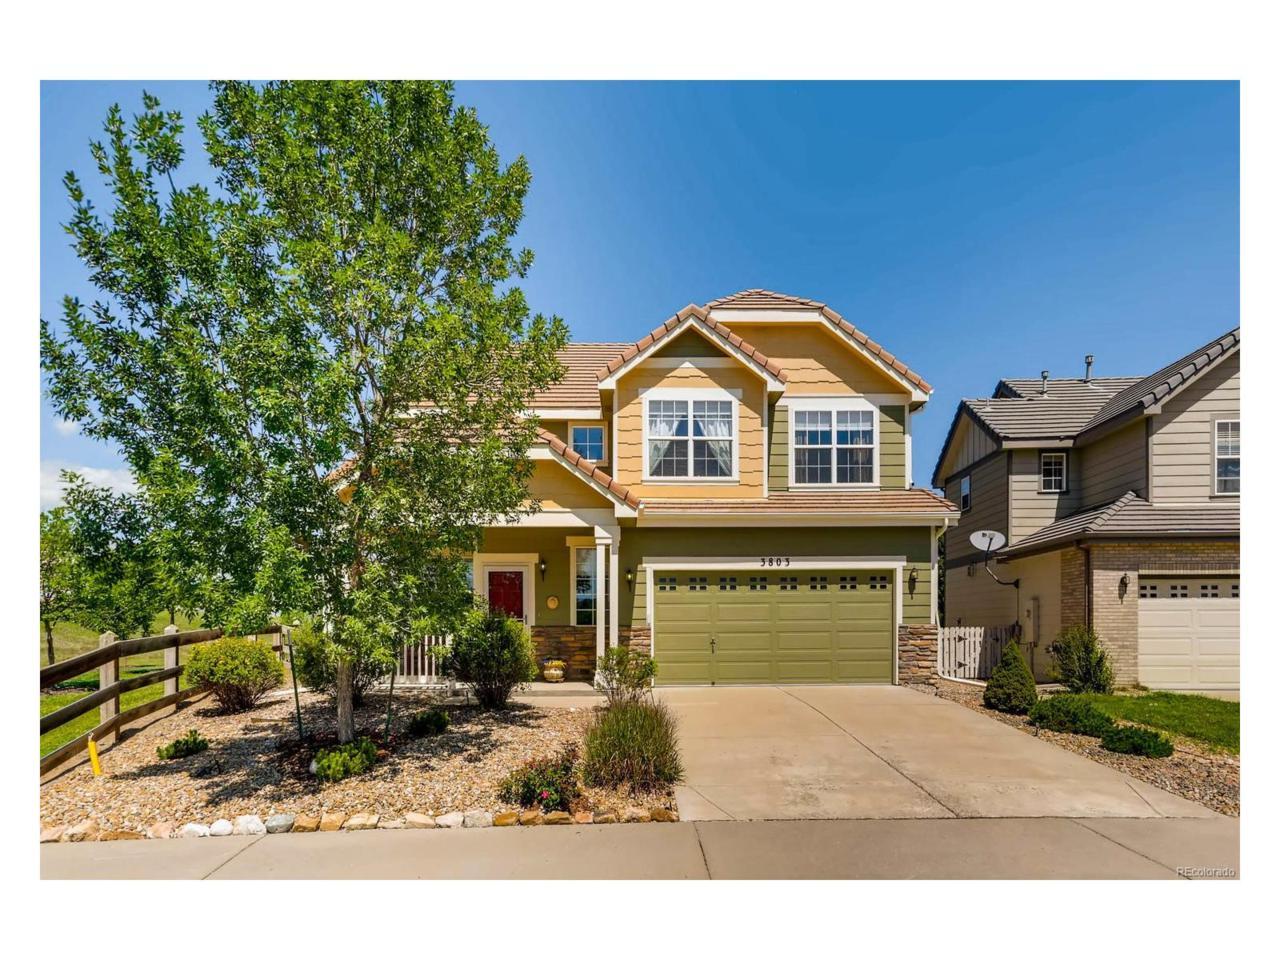 3803 Splendor Lane, Castle Rock, CO 80109 (MLS #2118307) :: 8z Real Estate